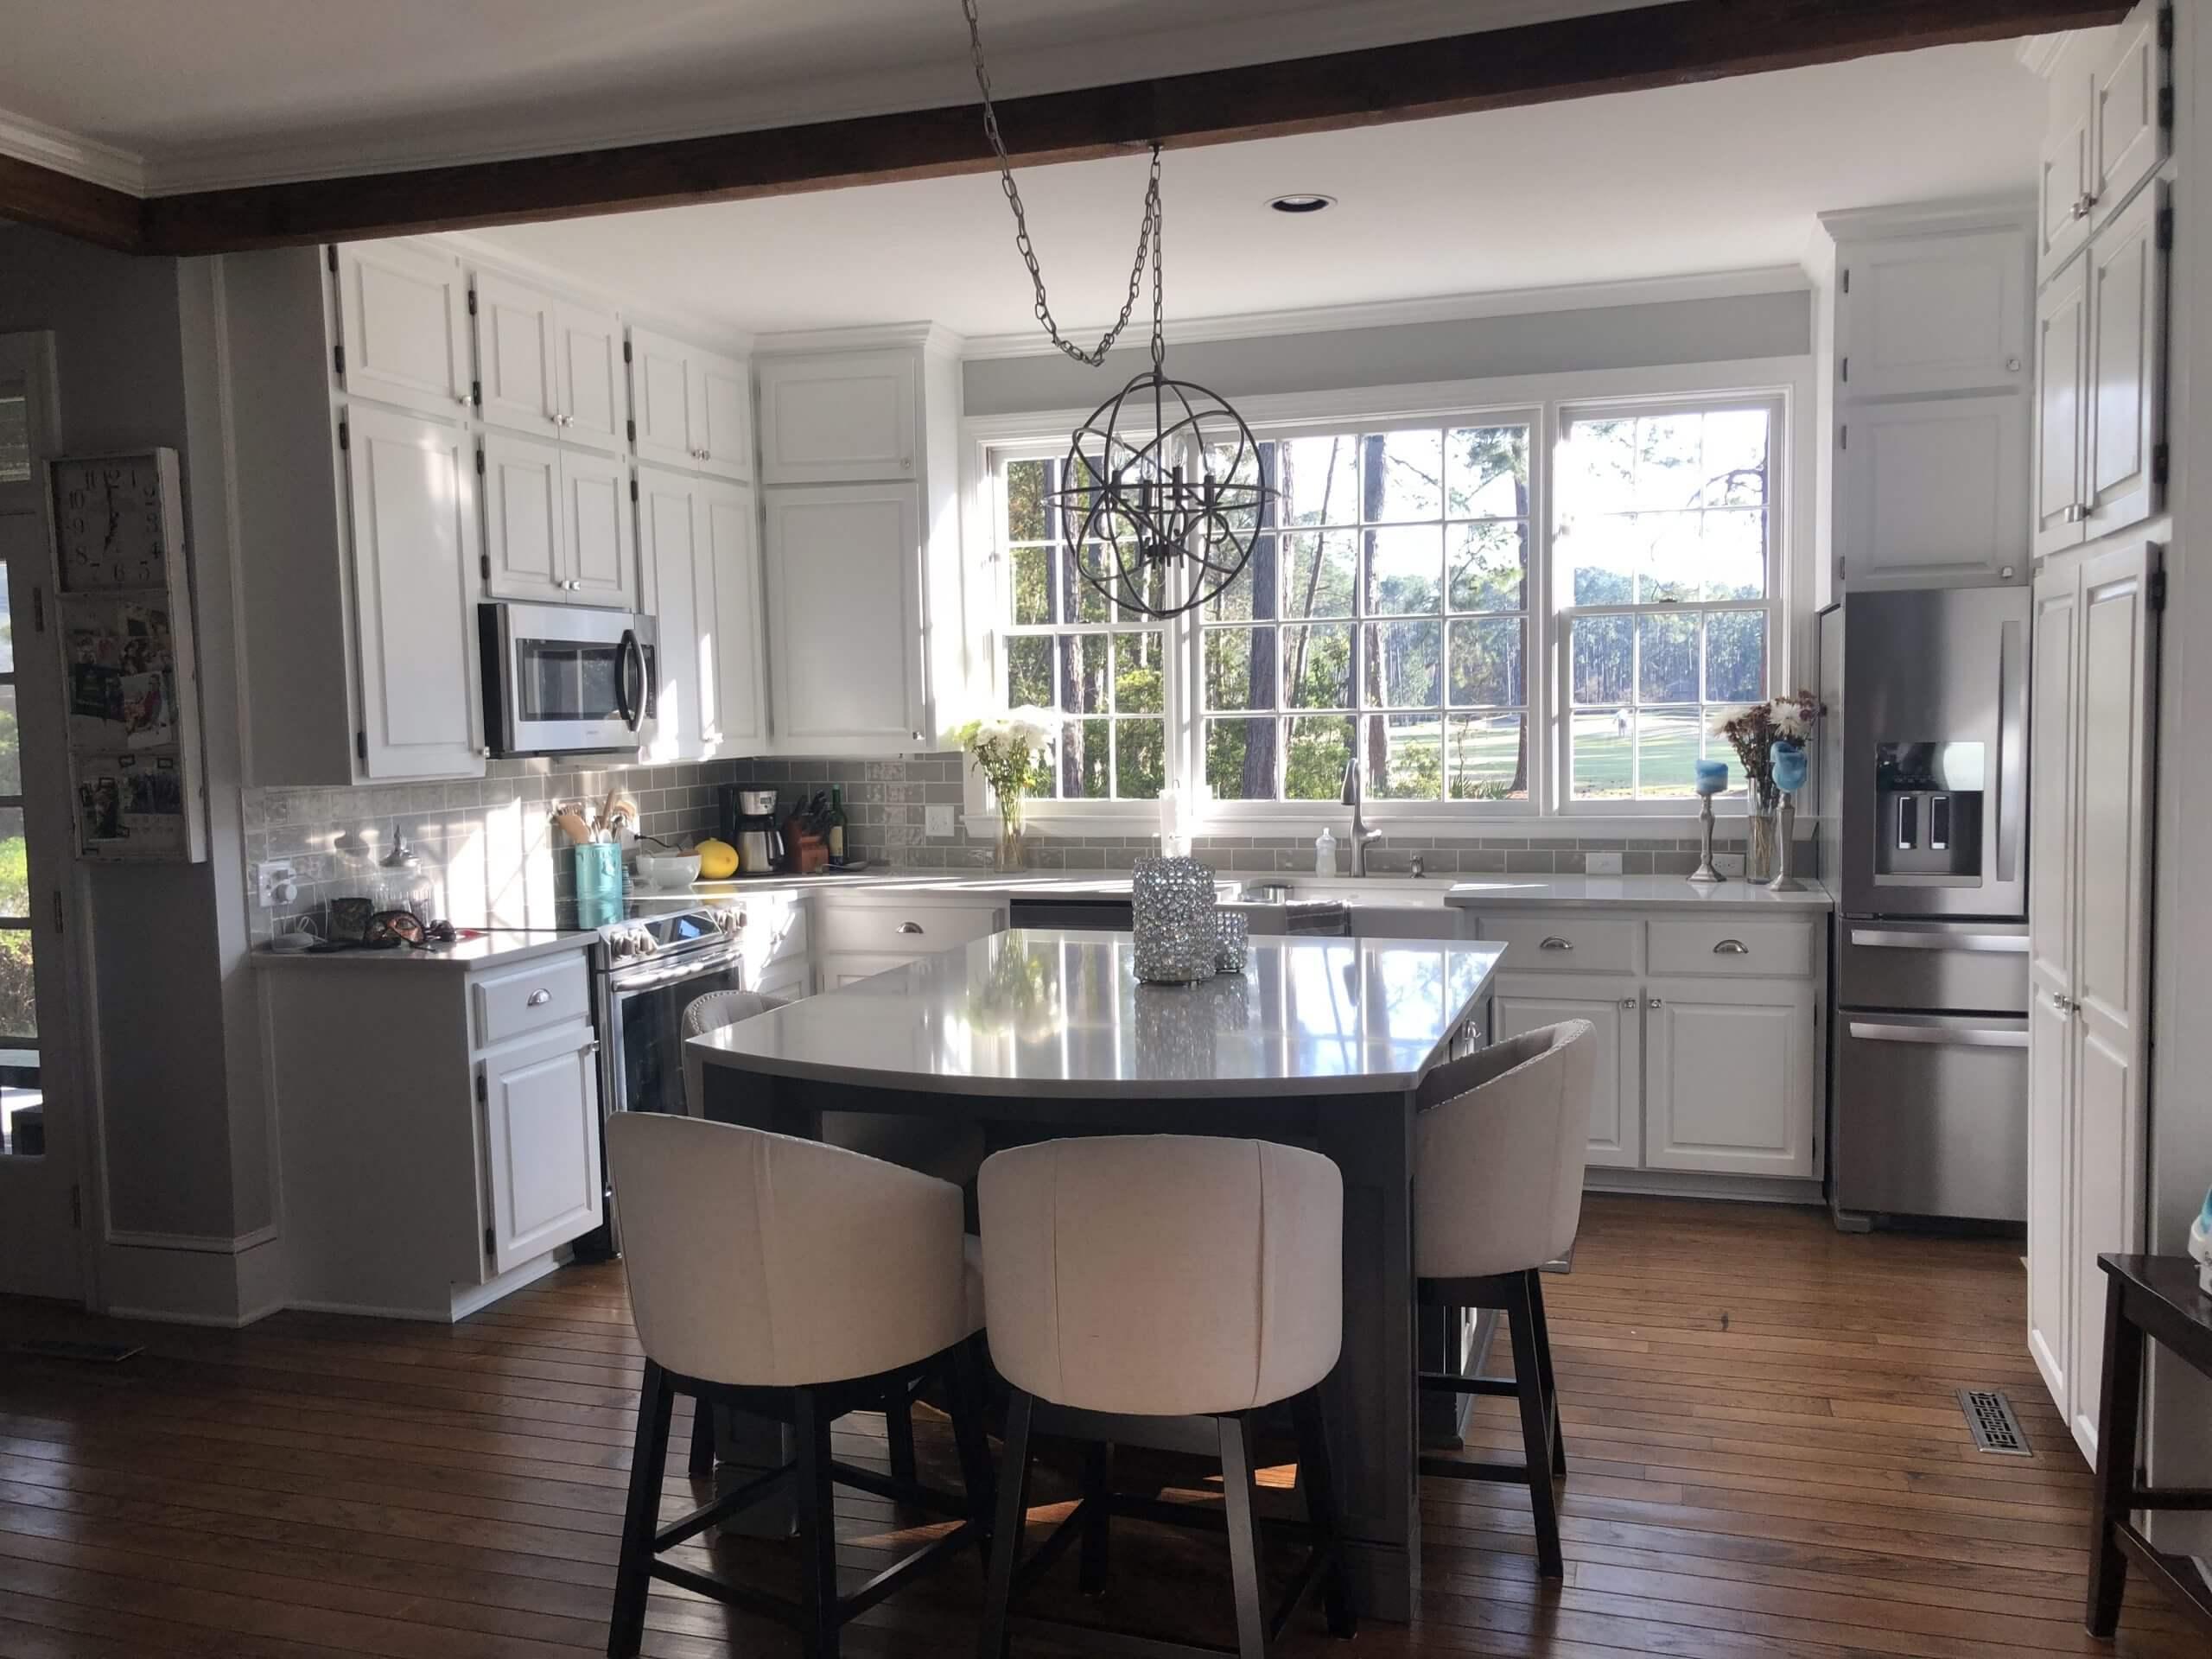 Hilton Head Kitchen Remodeling